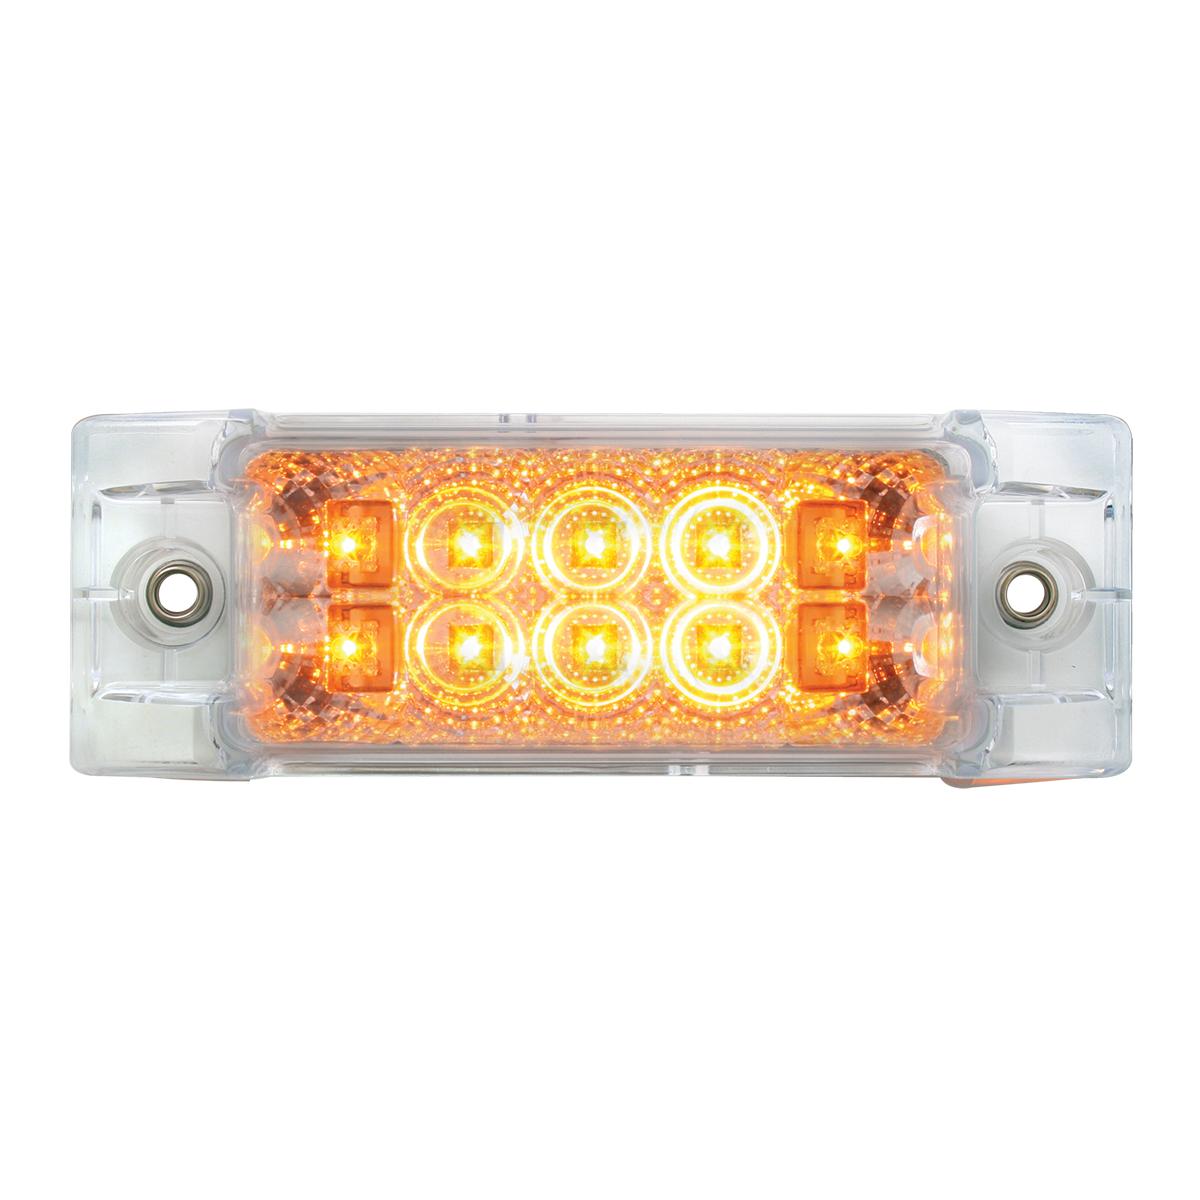 76211 Rectangular Wide Angle Spyder LED Marker Light in Amber/Clear